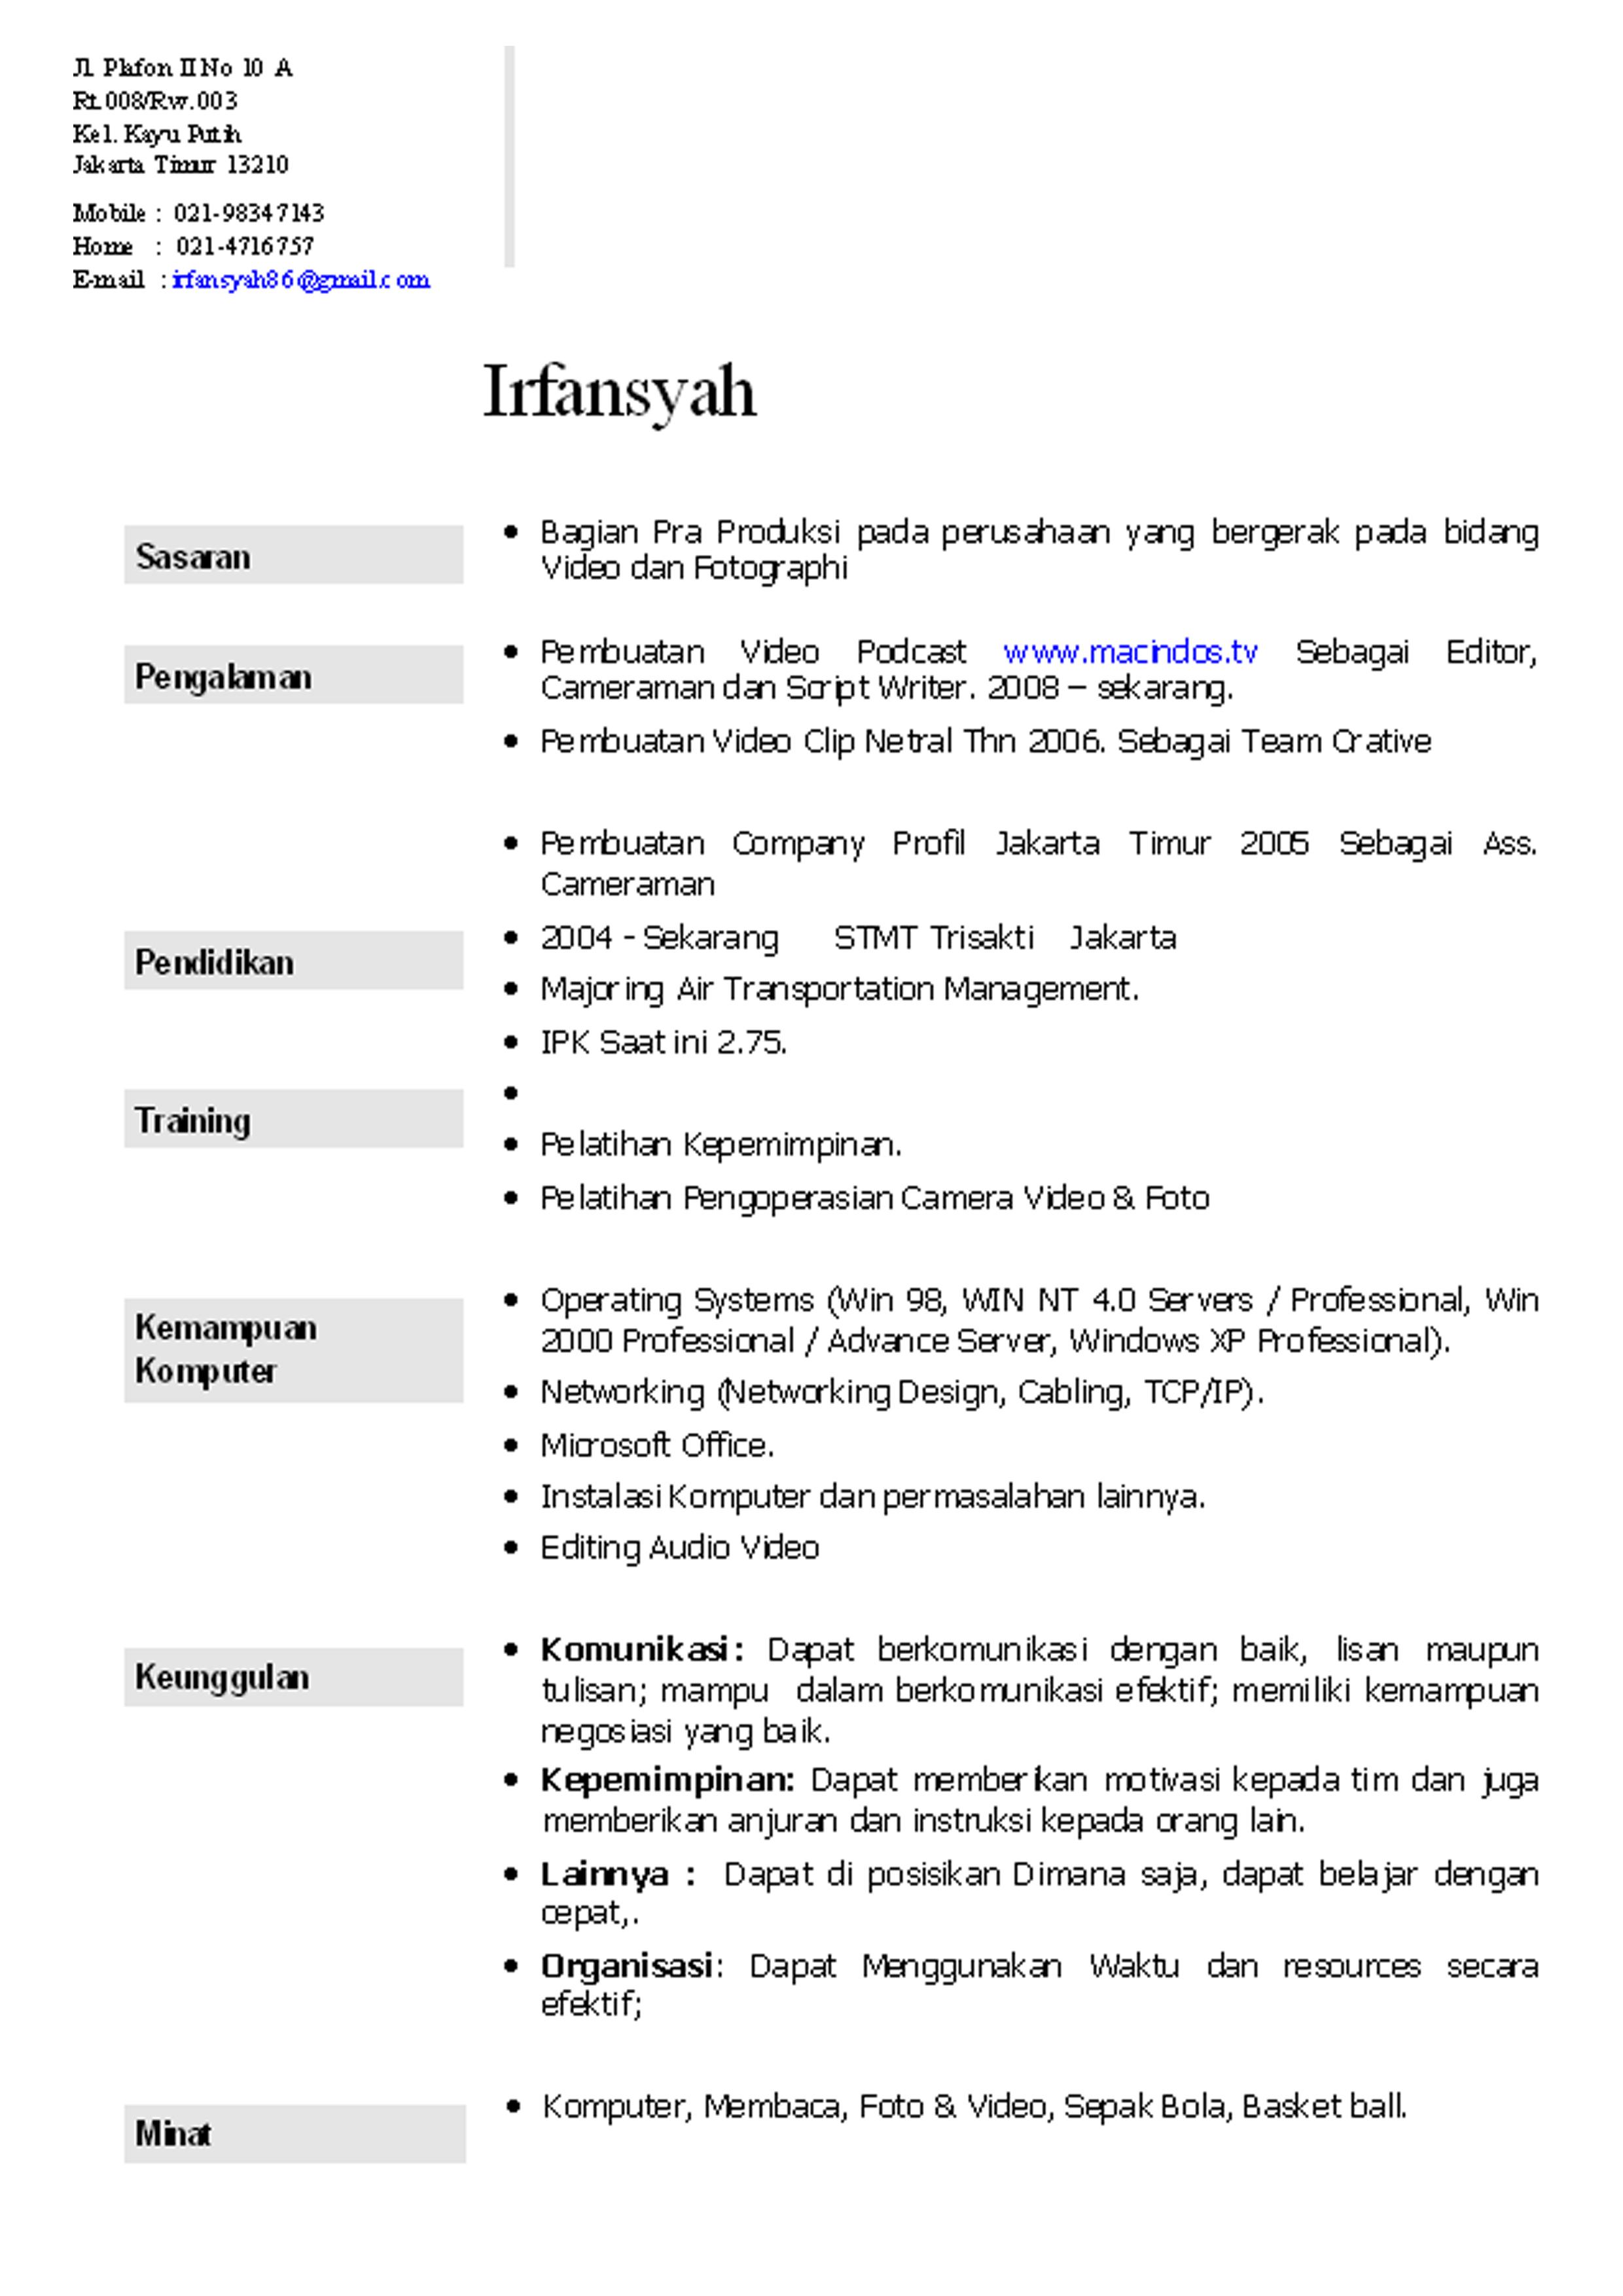 Contoh Cover Letter Bahasa Inggris Untuk Bank   Cover Letter Templates contoh application letter bahasa indonesia writefiction    web